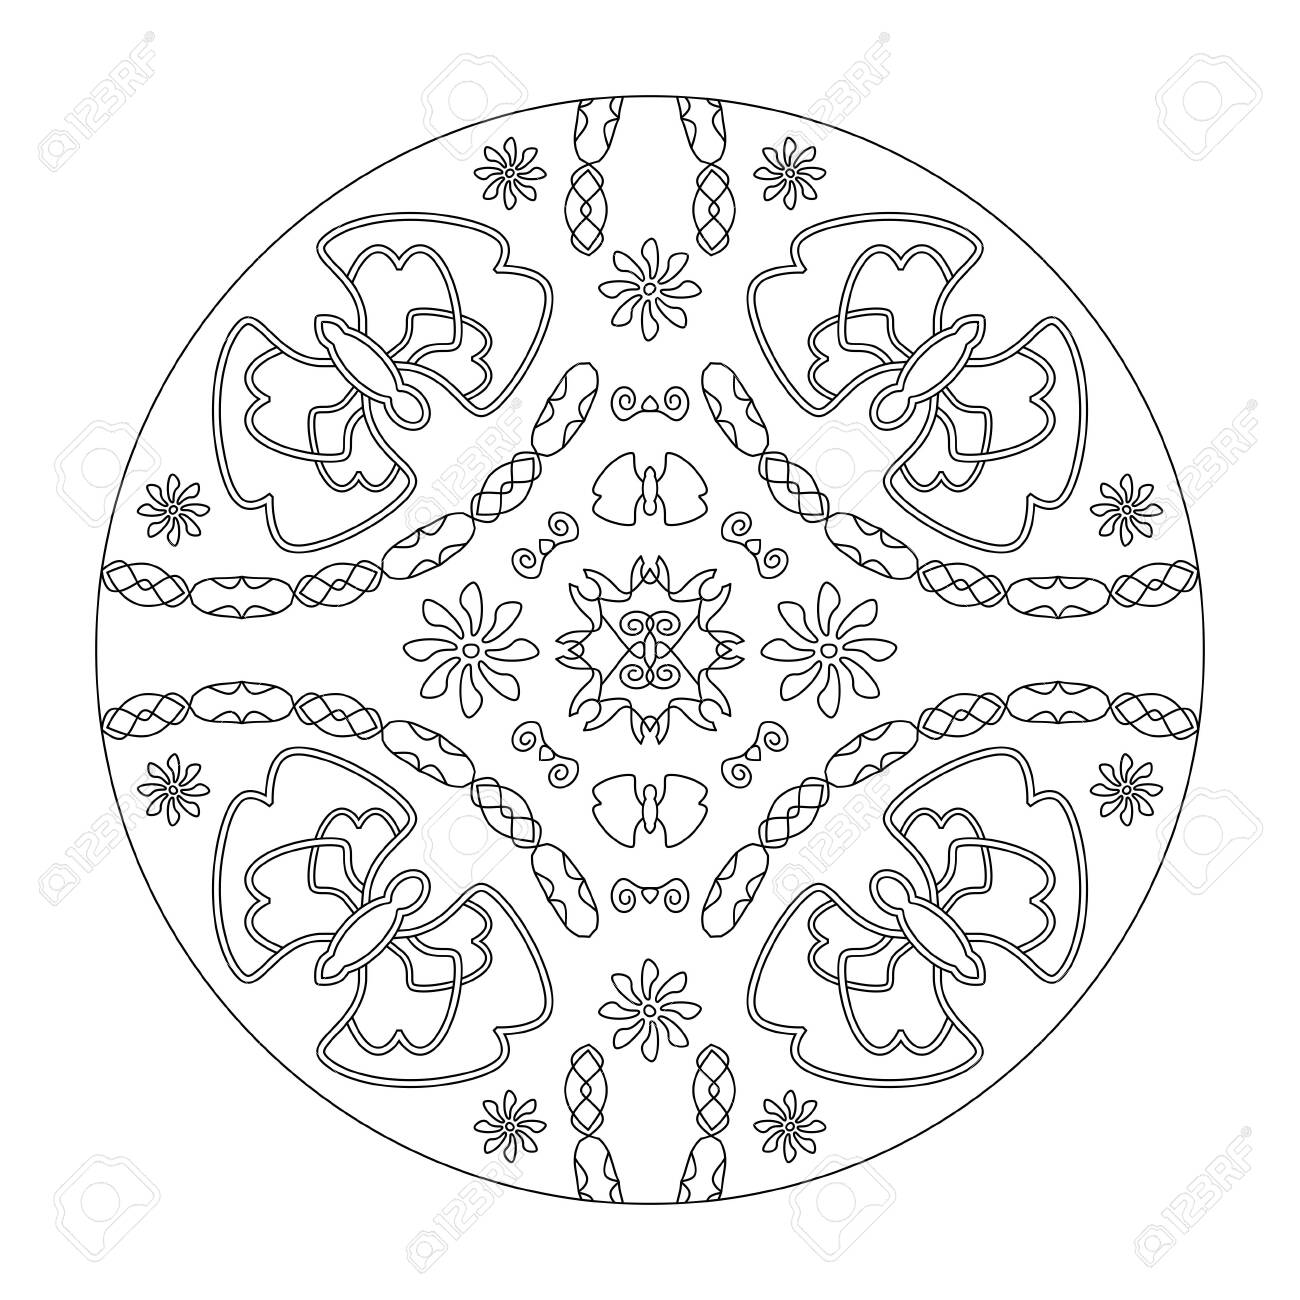 Раскраска антистрессовая огурцы | Paisley coloring pages ... | 1300x1300